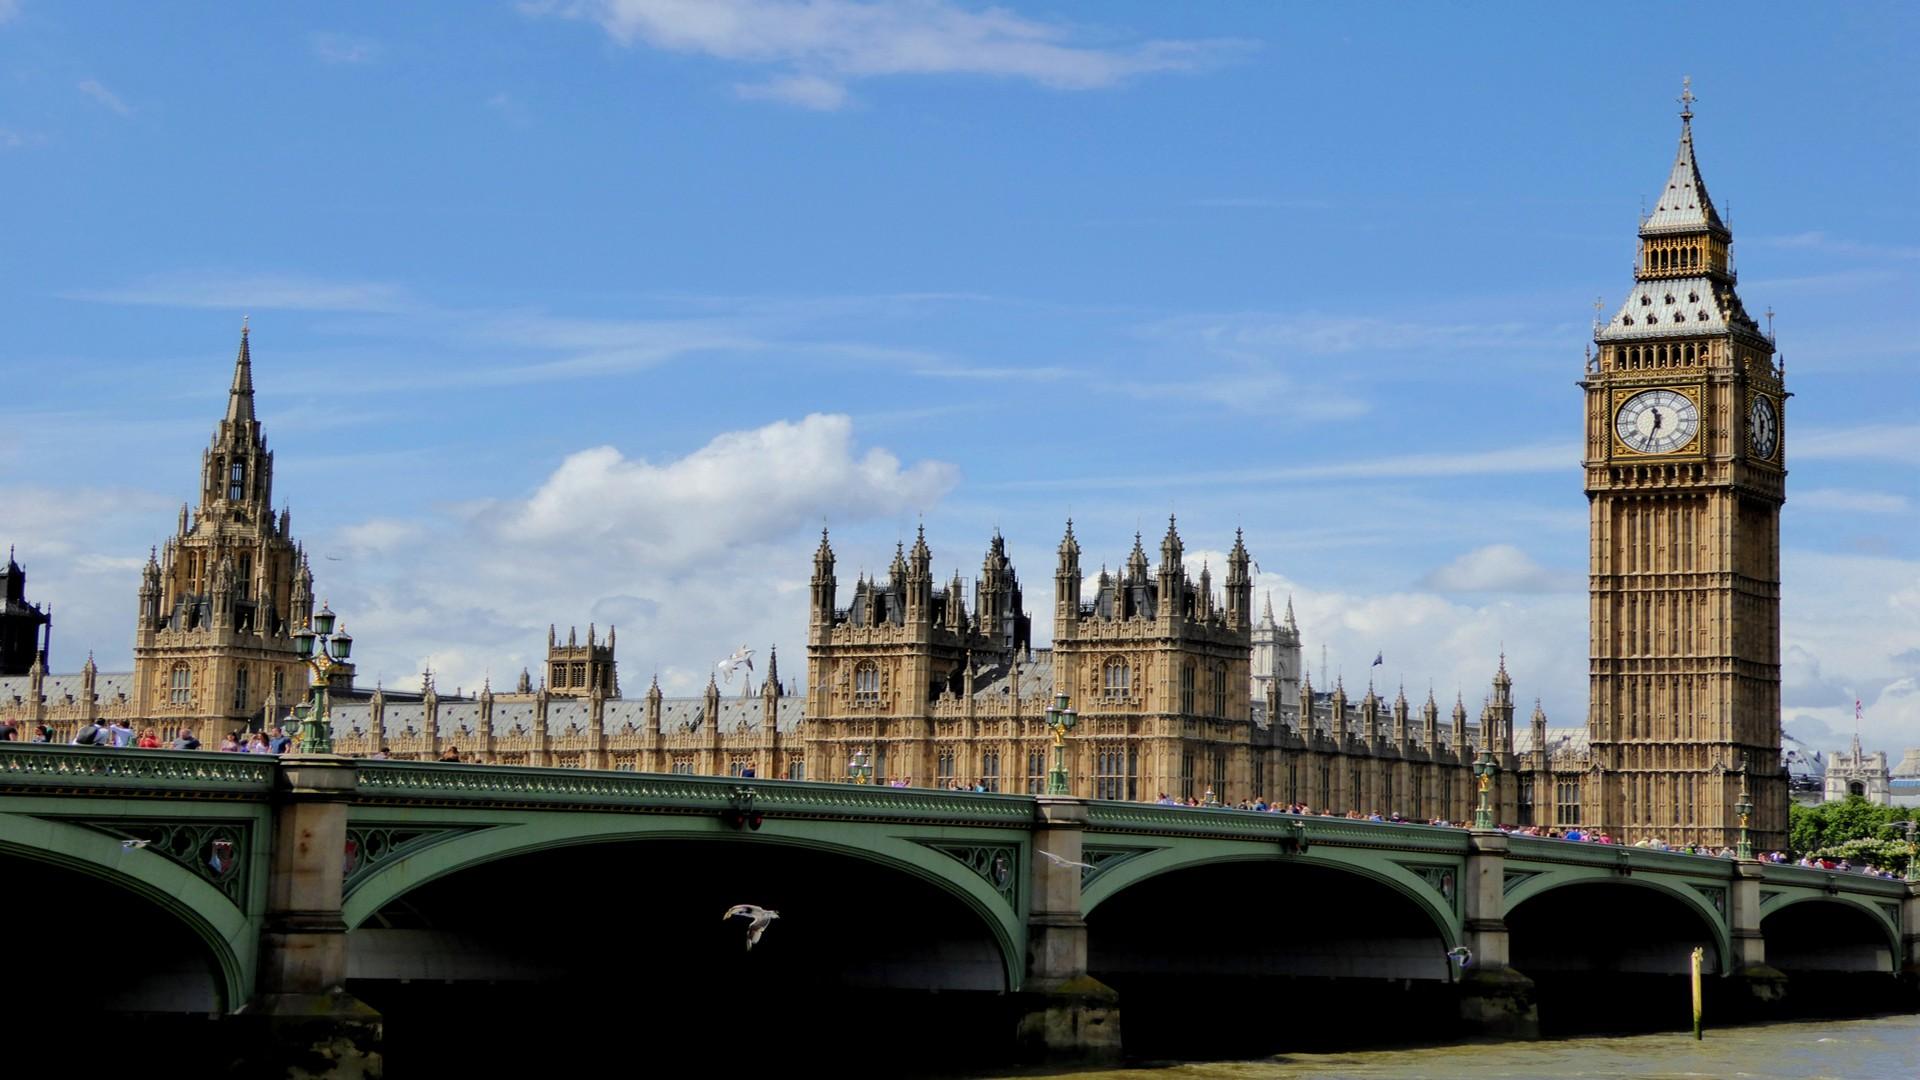 картинки лондона обои очень